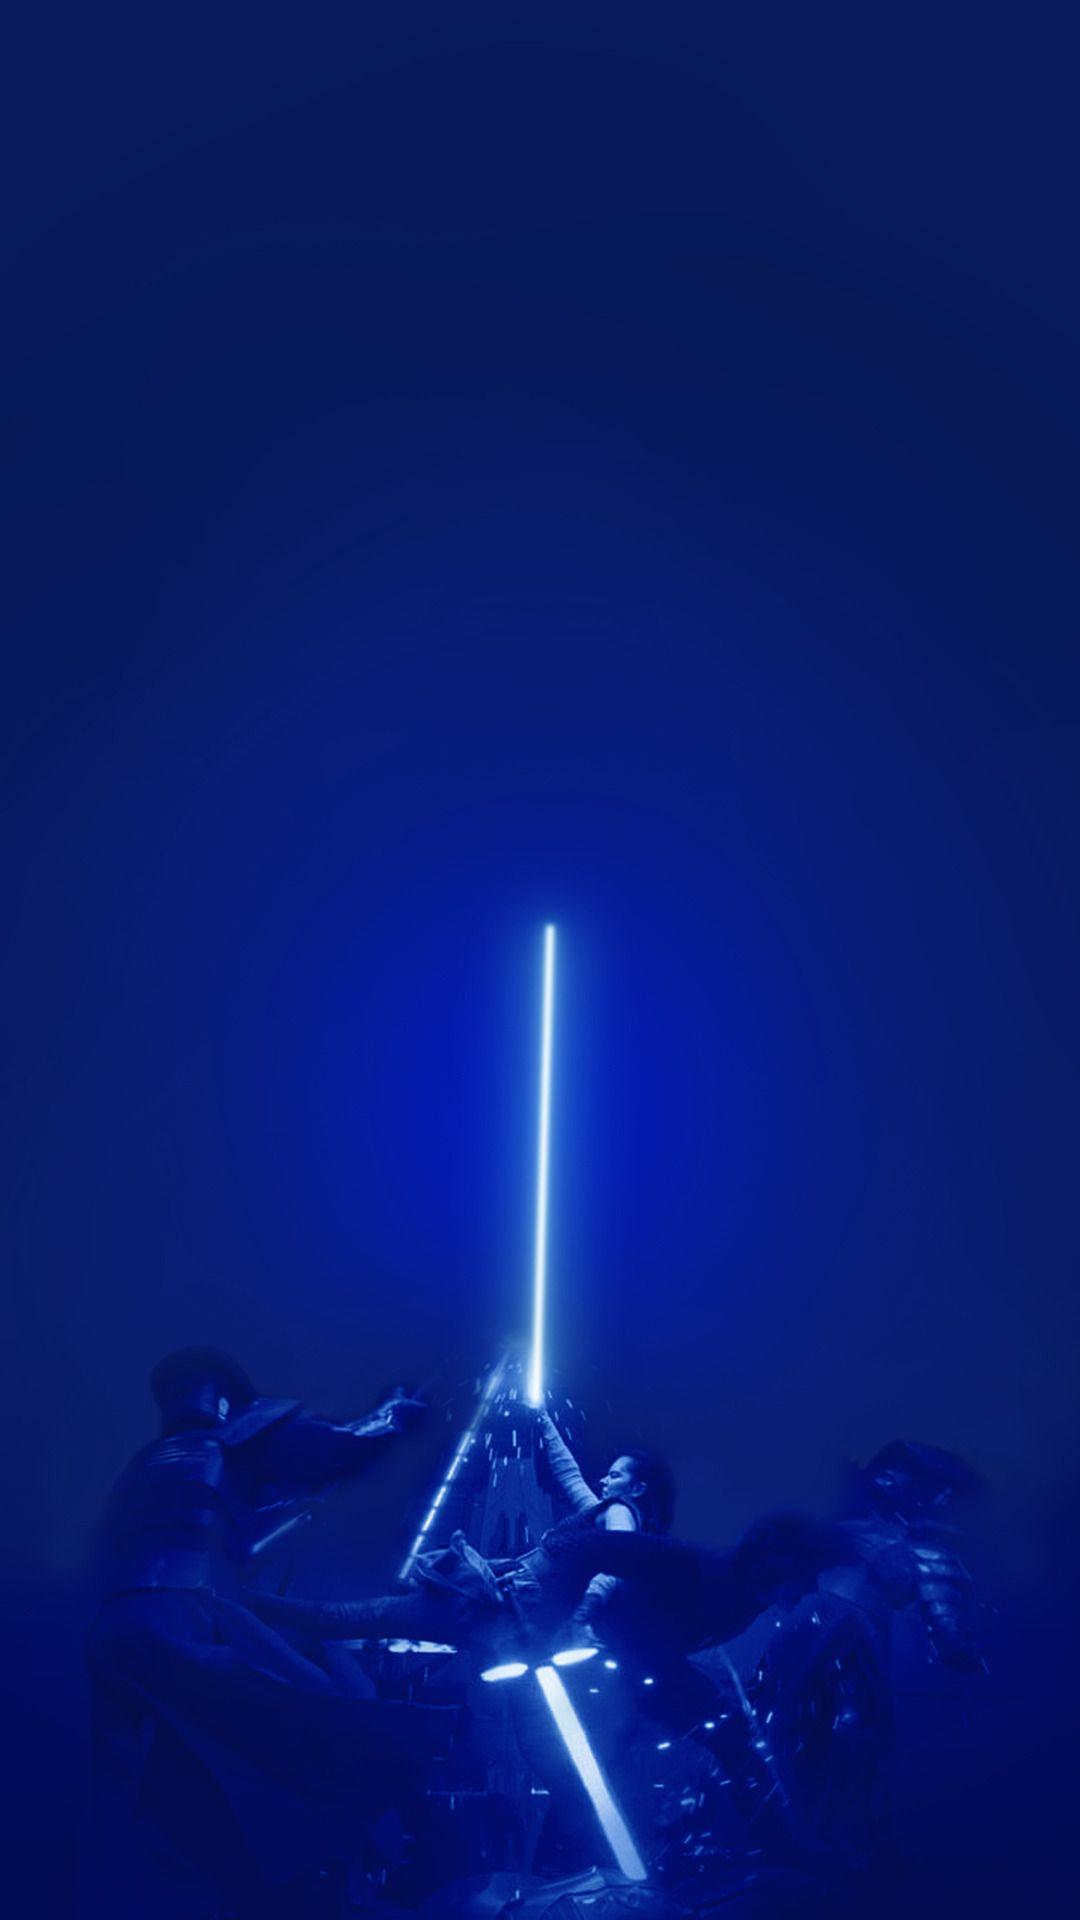 Rey Star Wars Wallpaper Tumblr